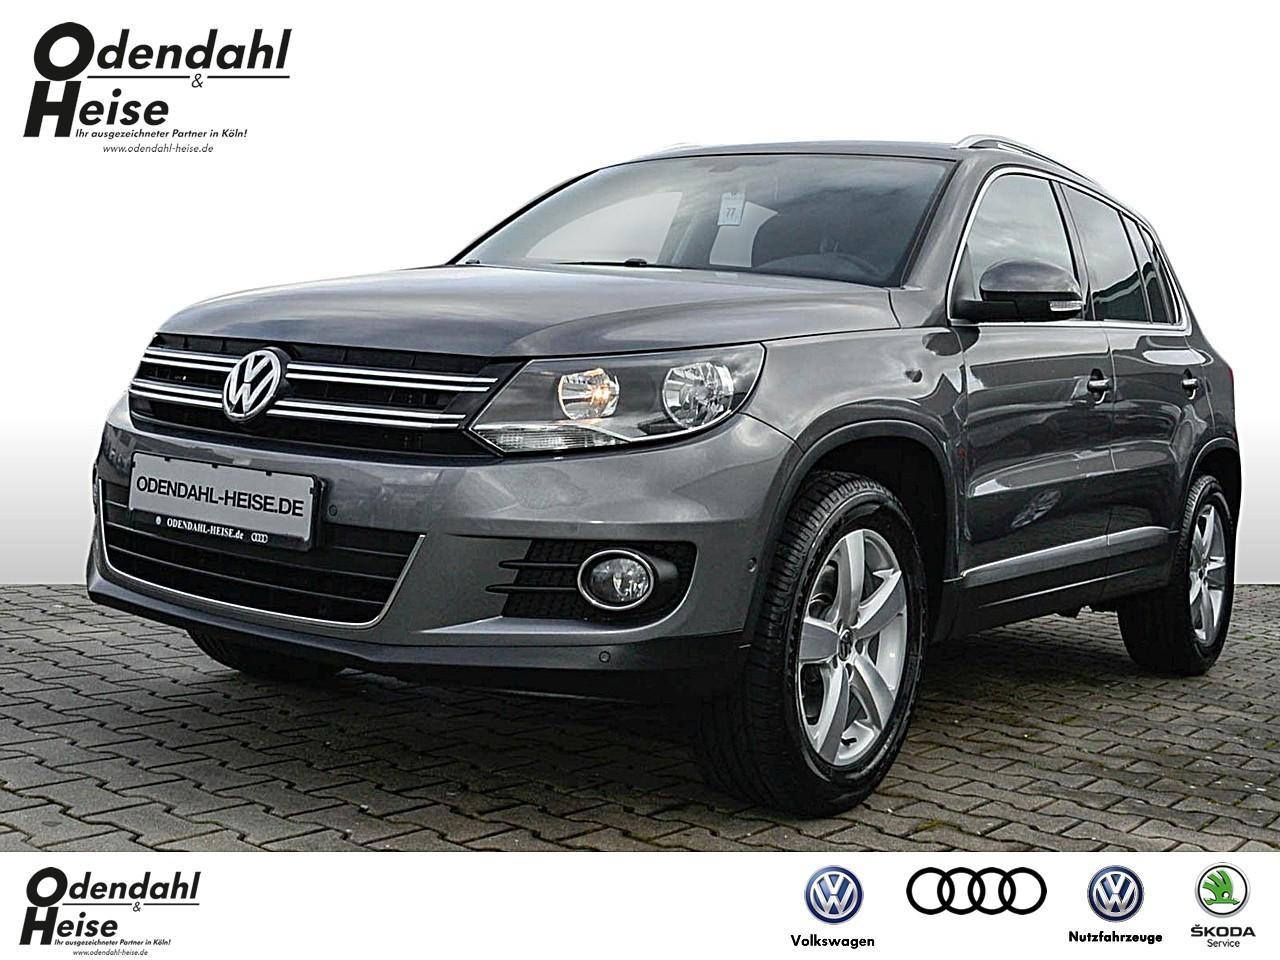 Volkswagen Tiguan Sport & Style 1.4 TSI BMT EU5 Sport & Style Life, Jahr 2013, Benzin